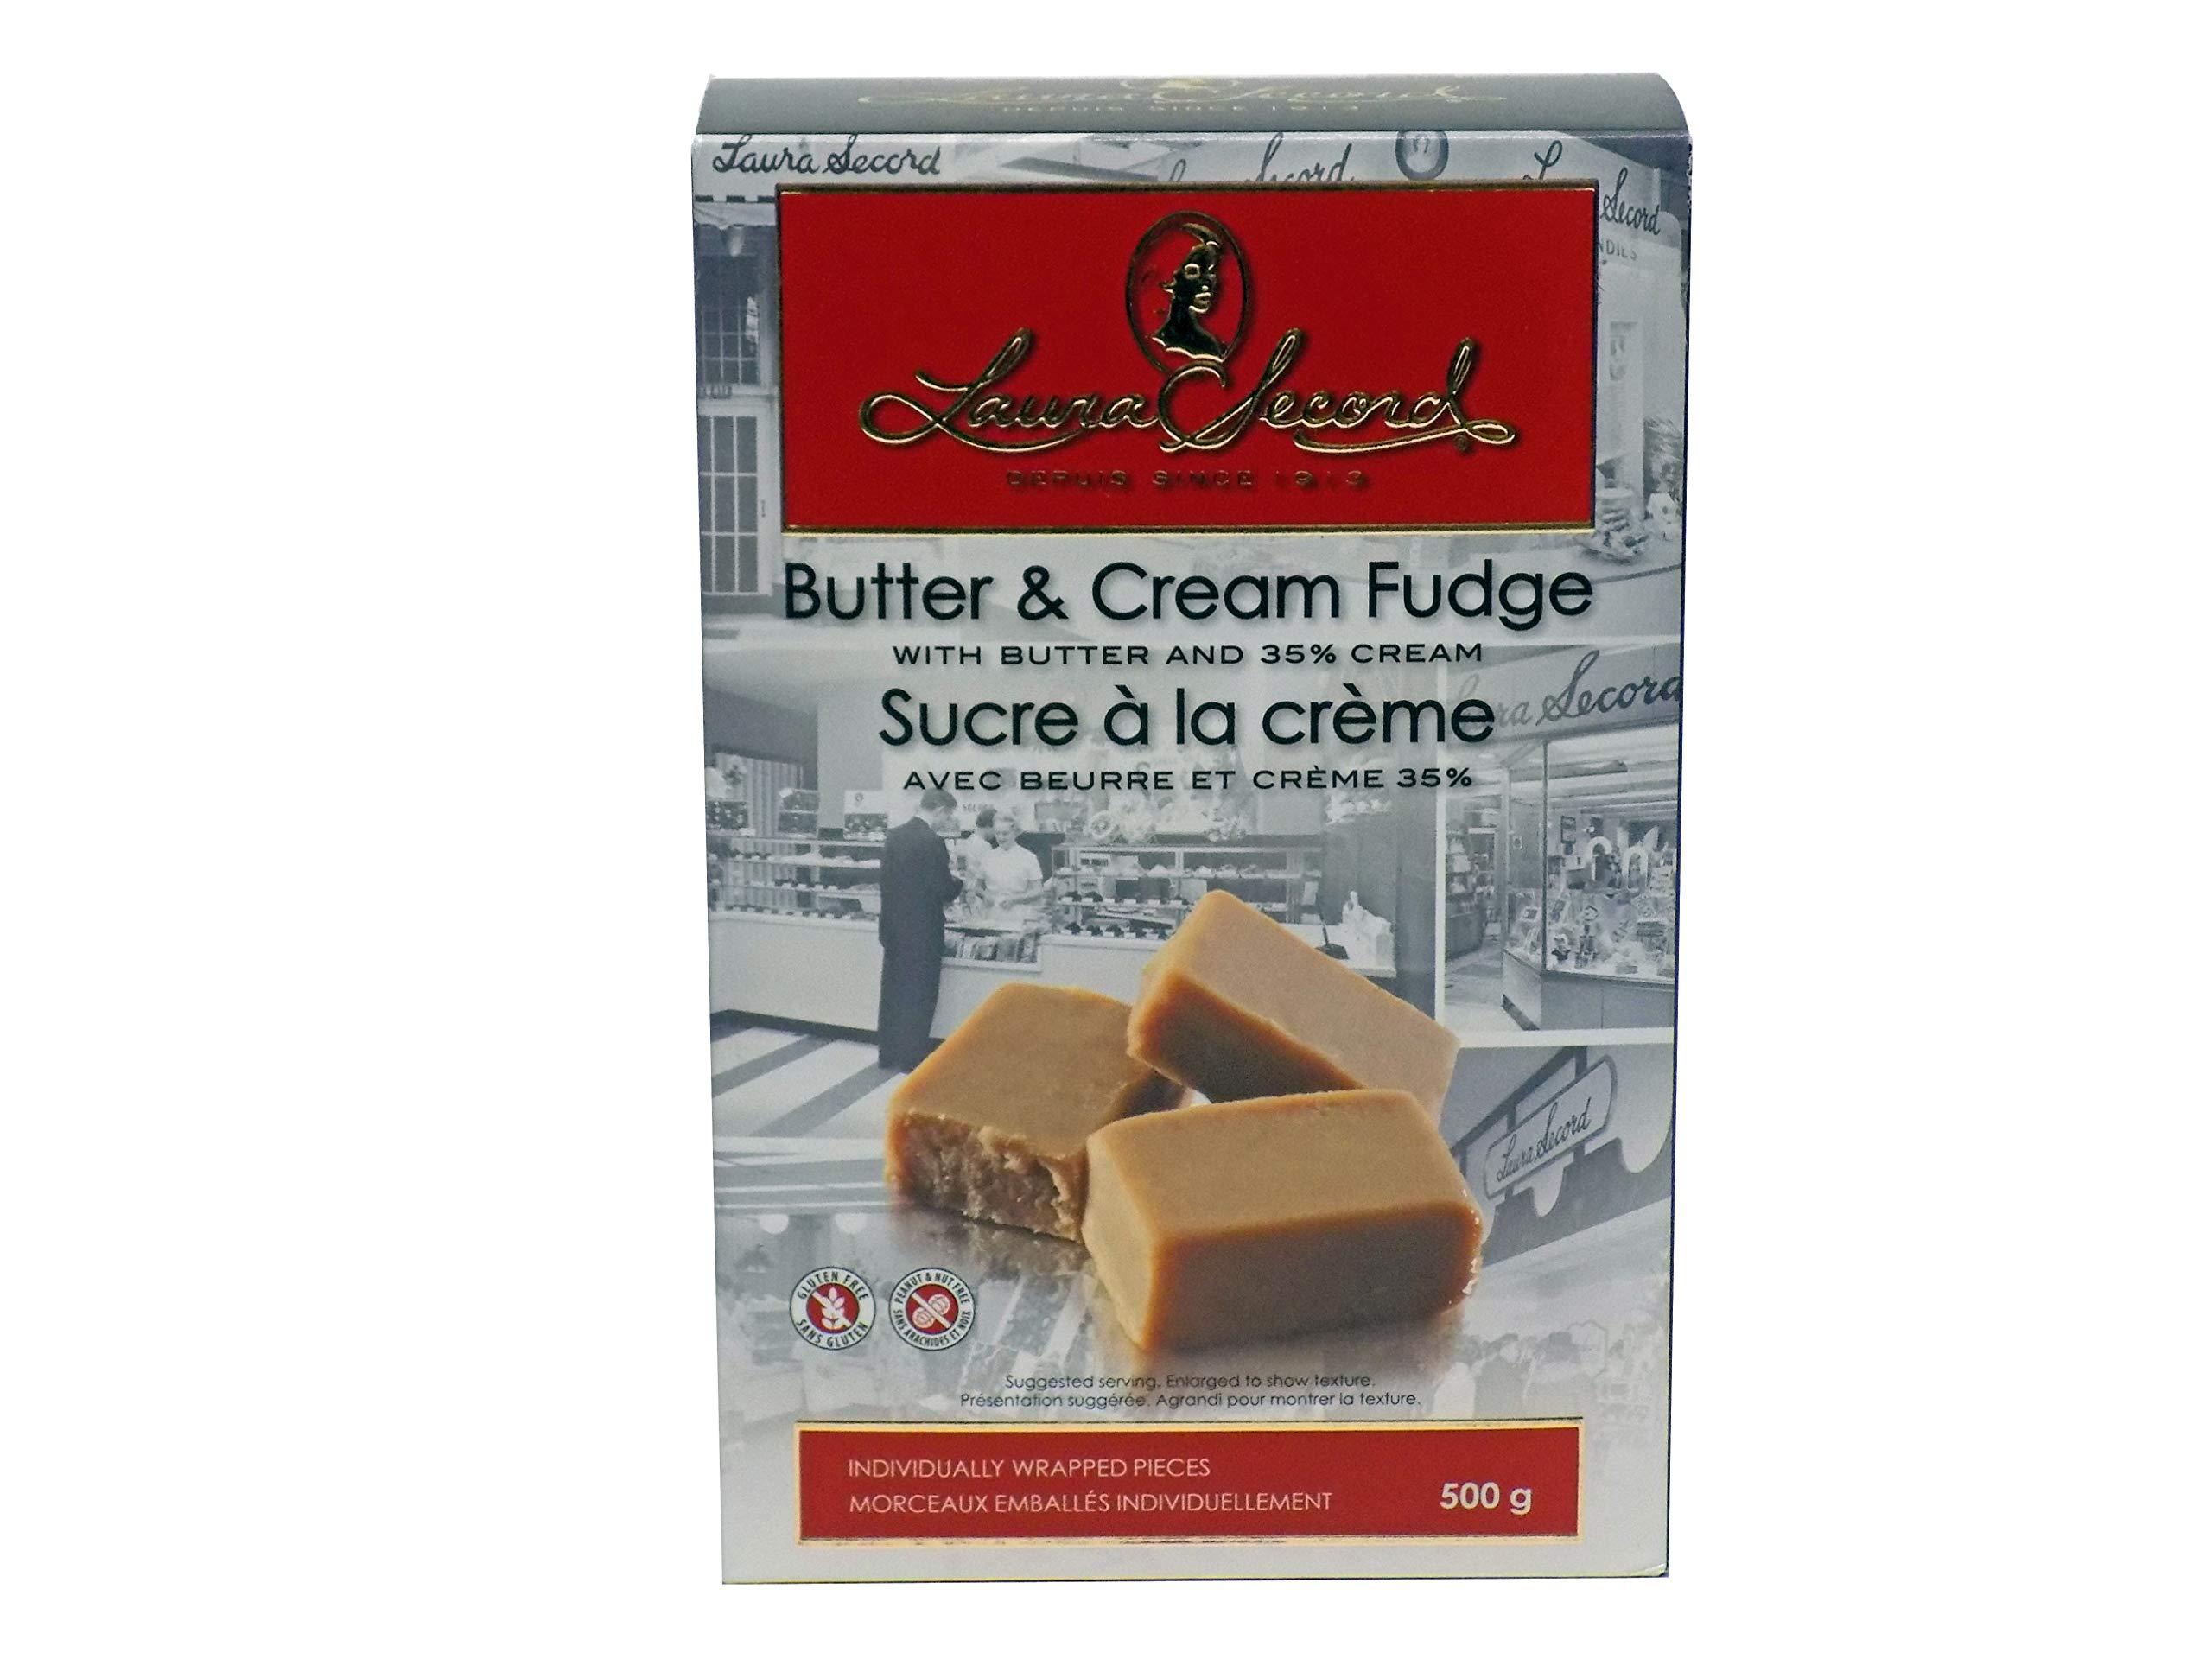 Laura Secord Butter & Cream Fudge by Laura Secord